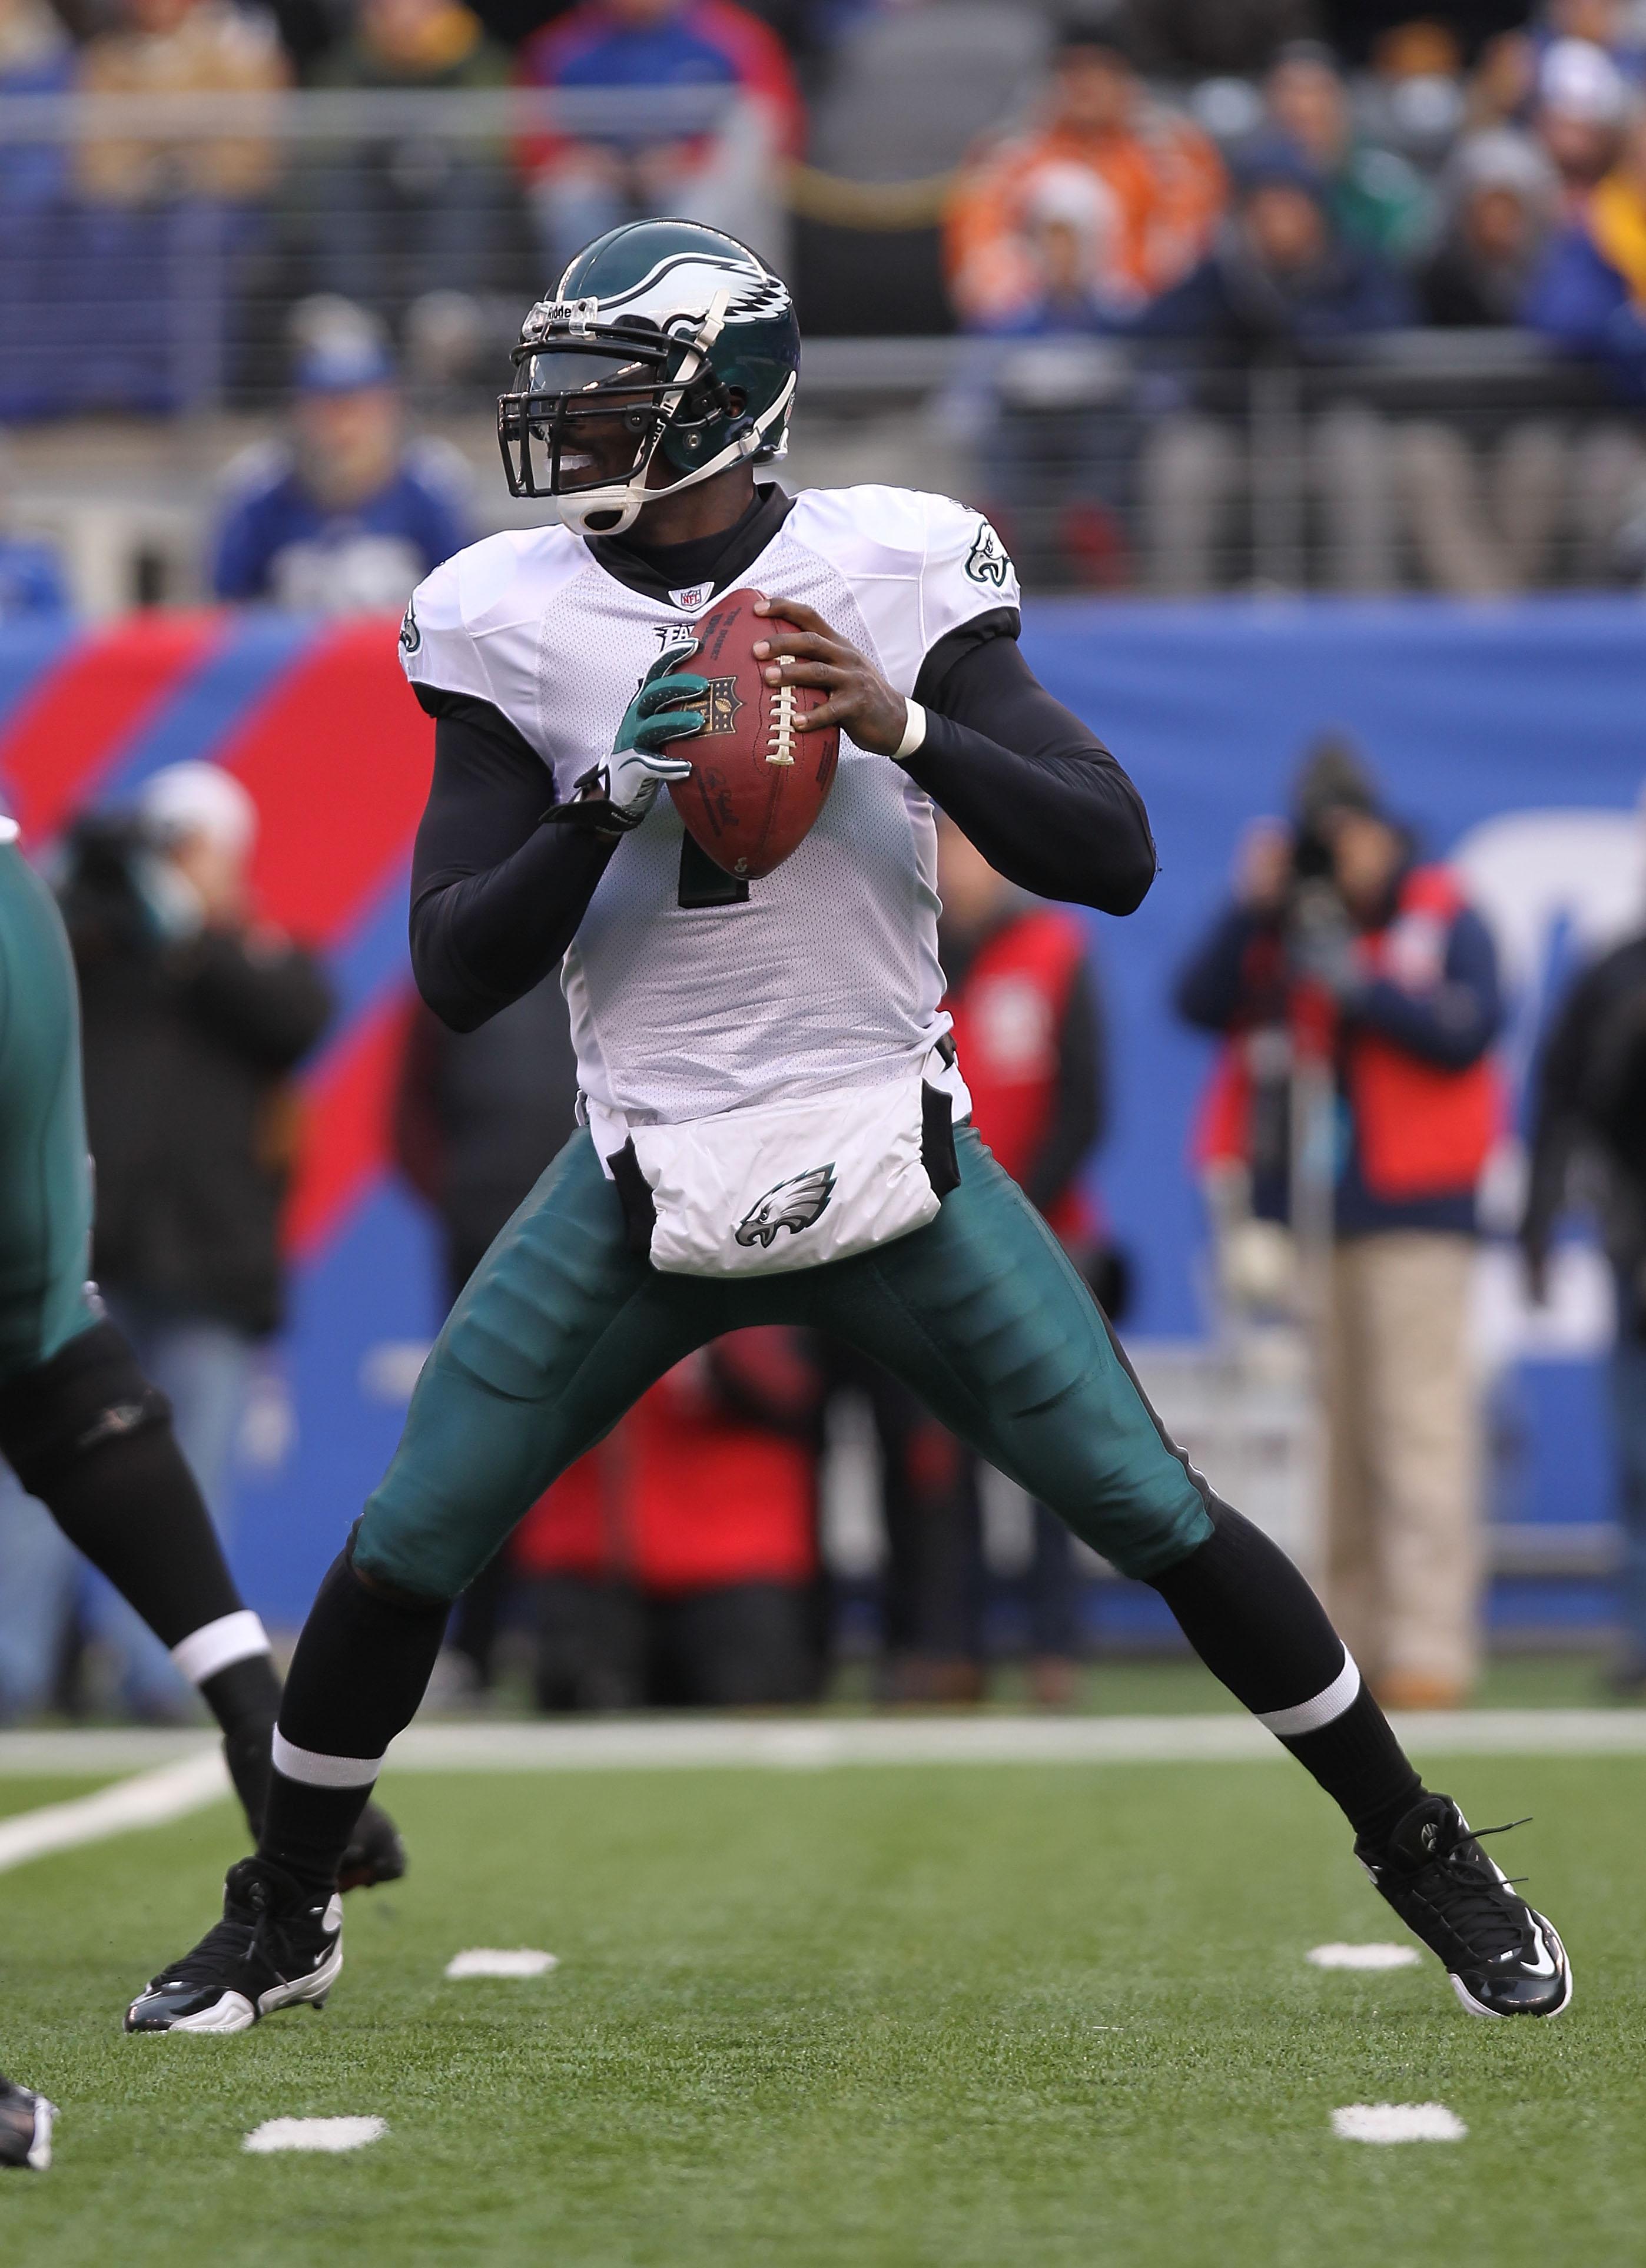 9f53cf38 Michael Vick vs. Tom Brady: 5 Reasons Why The Eagles' Quarterback Can't Be  MVP